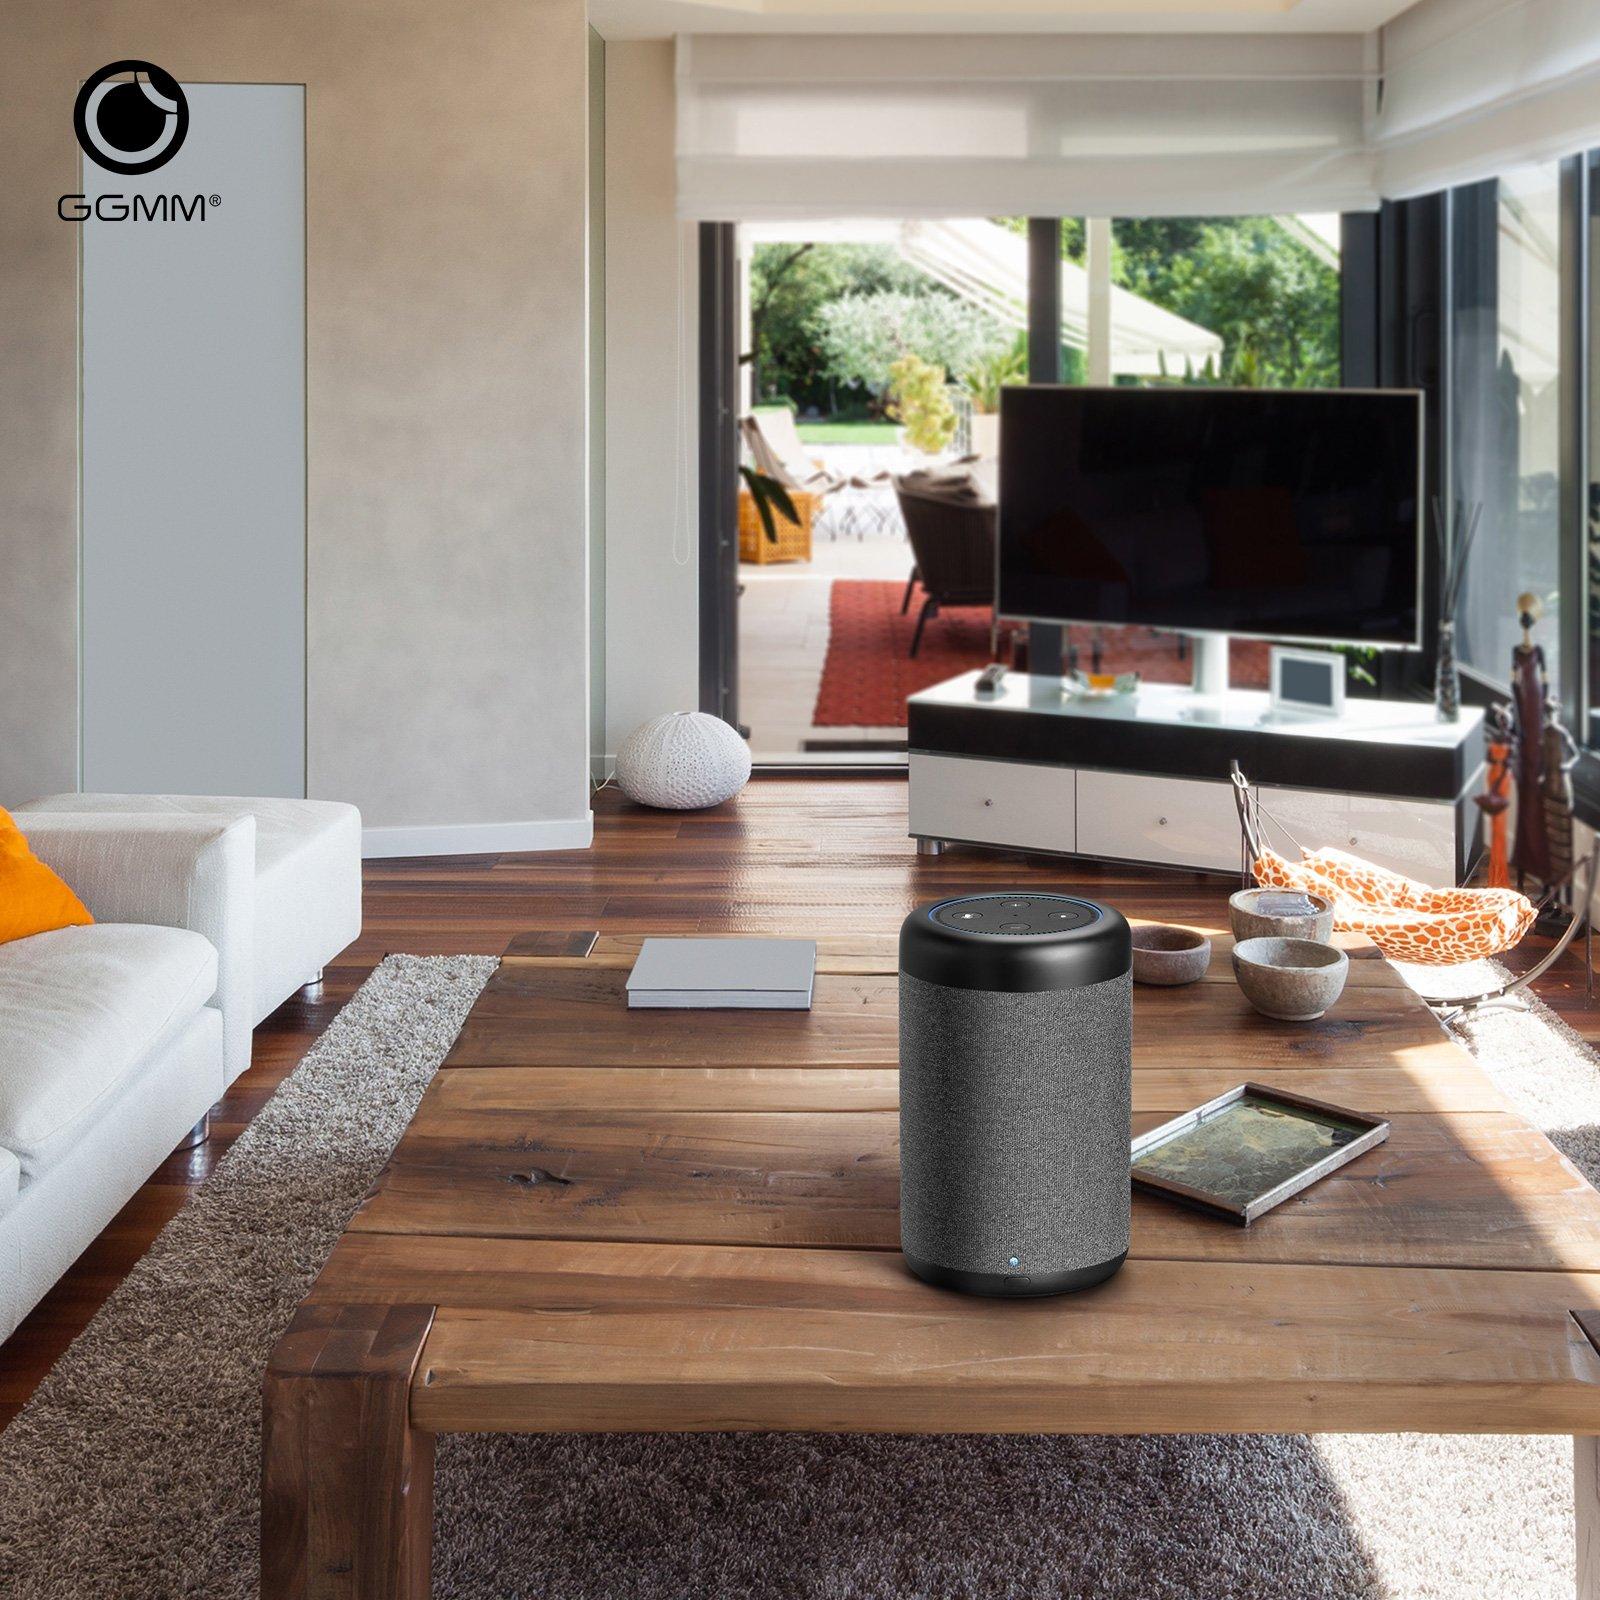 GGMM D6 Portable Speaker for Amazon Echo Dot 2nd Generation, 20W Powerful True 360 Alexa Speakers (DOT SOLD SEPARATELY) by GGMM (Image #7)